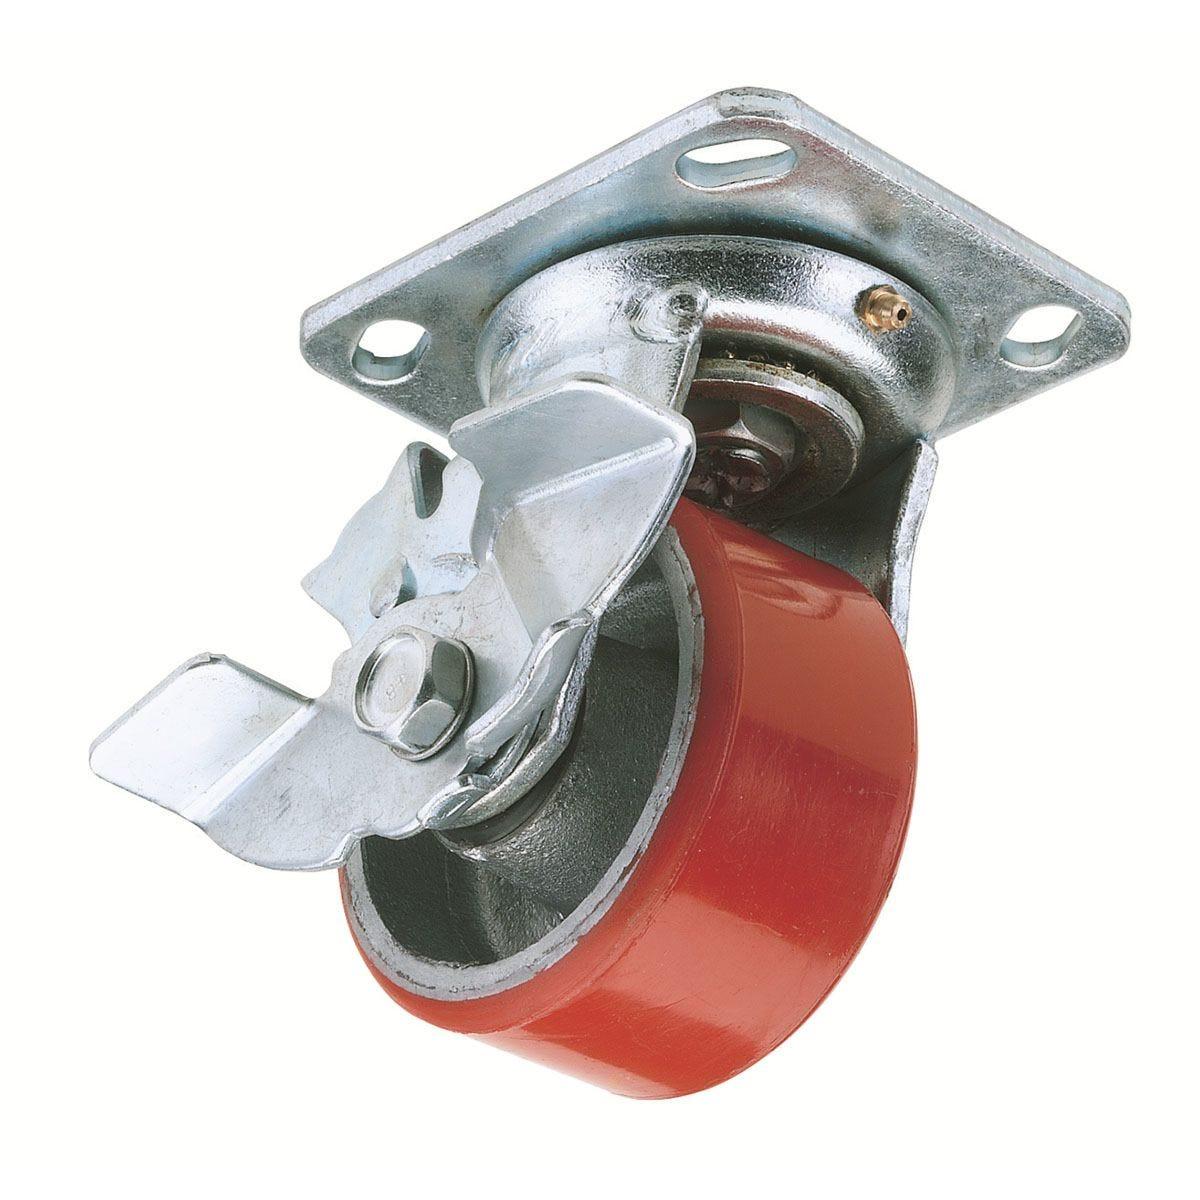 Draper 125mm Diameter Swivel Plate Fi x Ing Heavy Duty Polyurethane Wheel with Brake - S.W.L. 300Kg